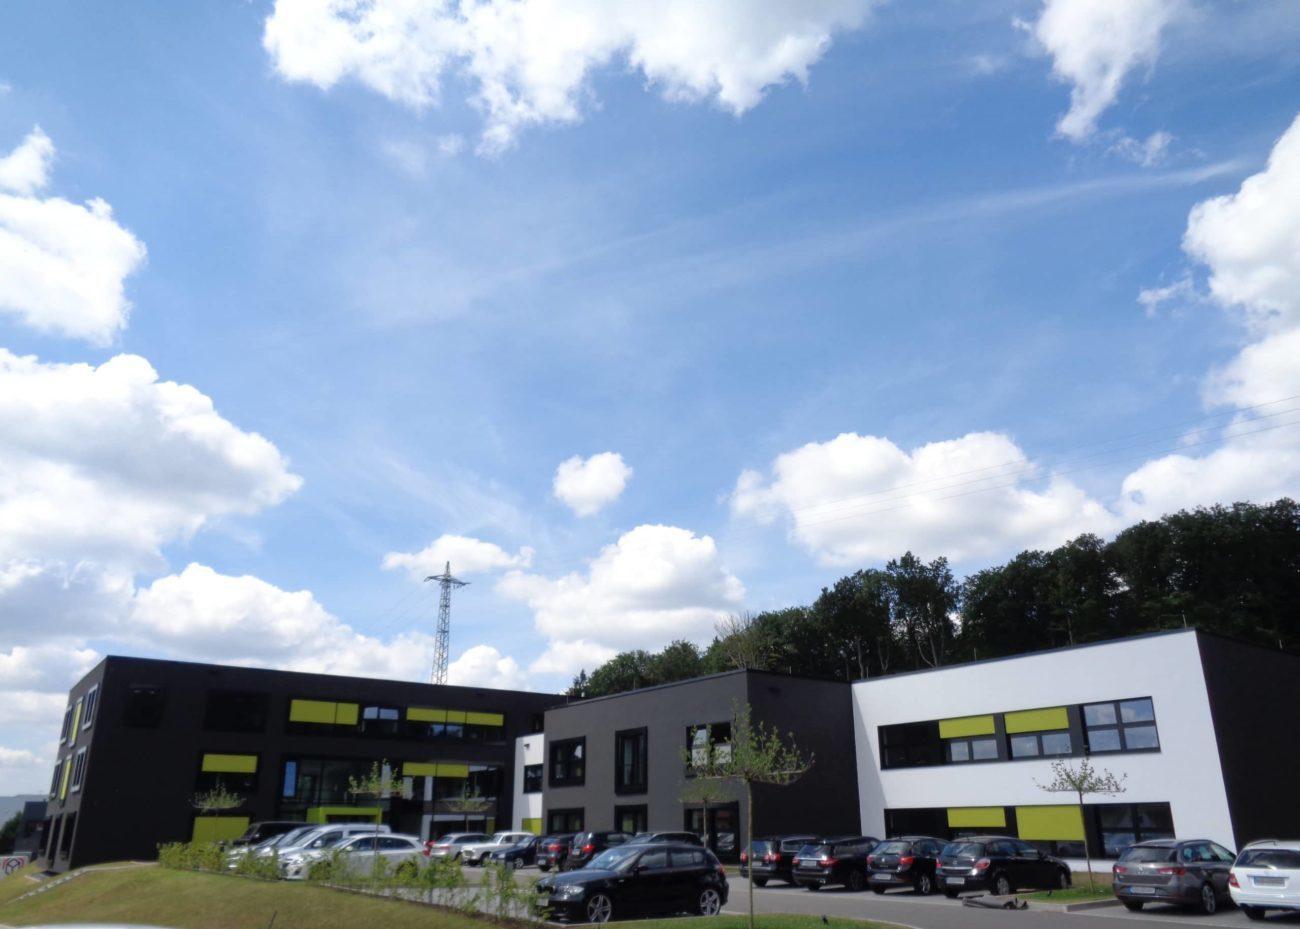 <b>Herweck AG, St. Ingbert-Rohrbach</b>